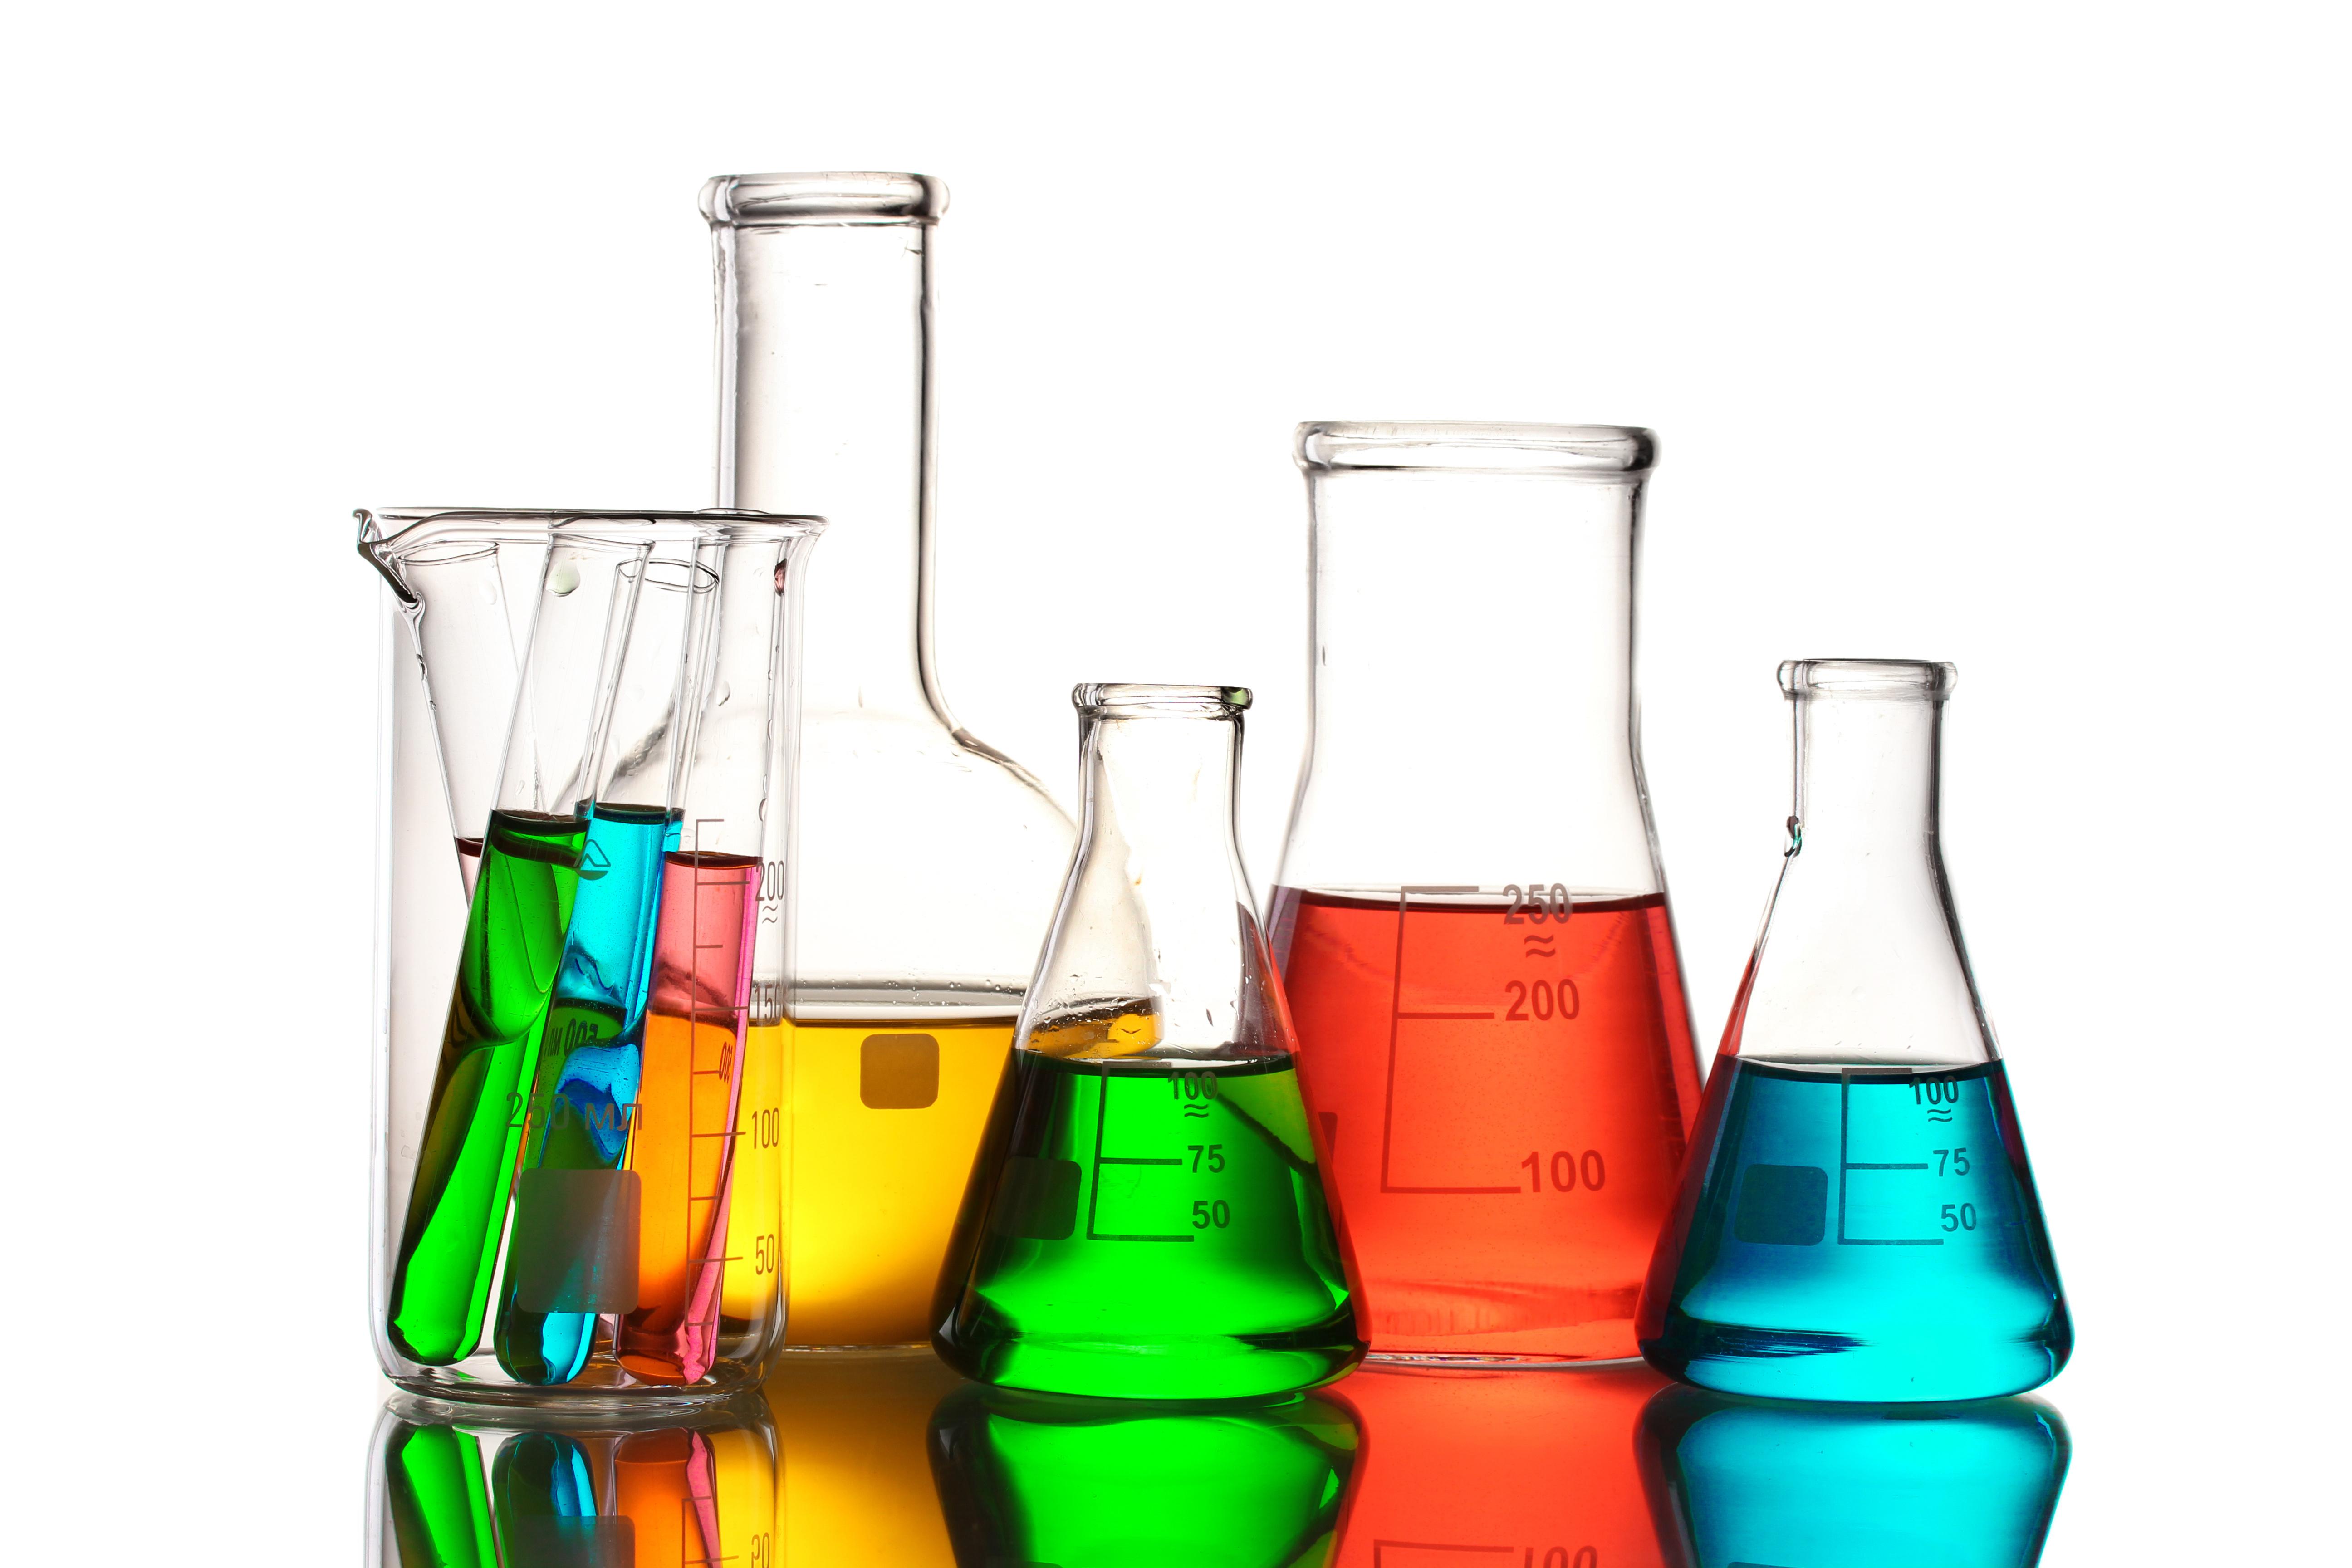 logo chimica